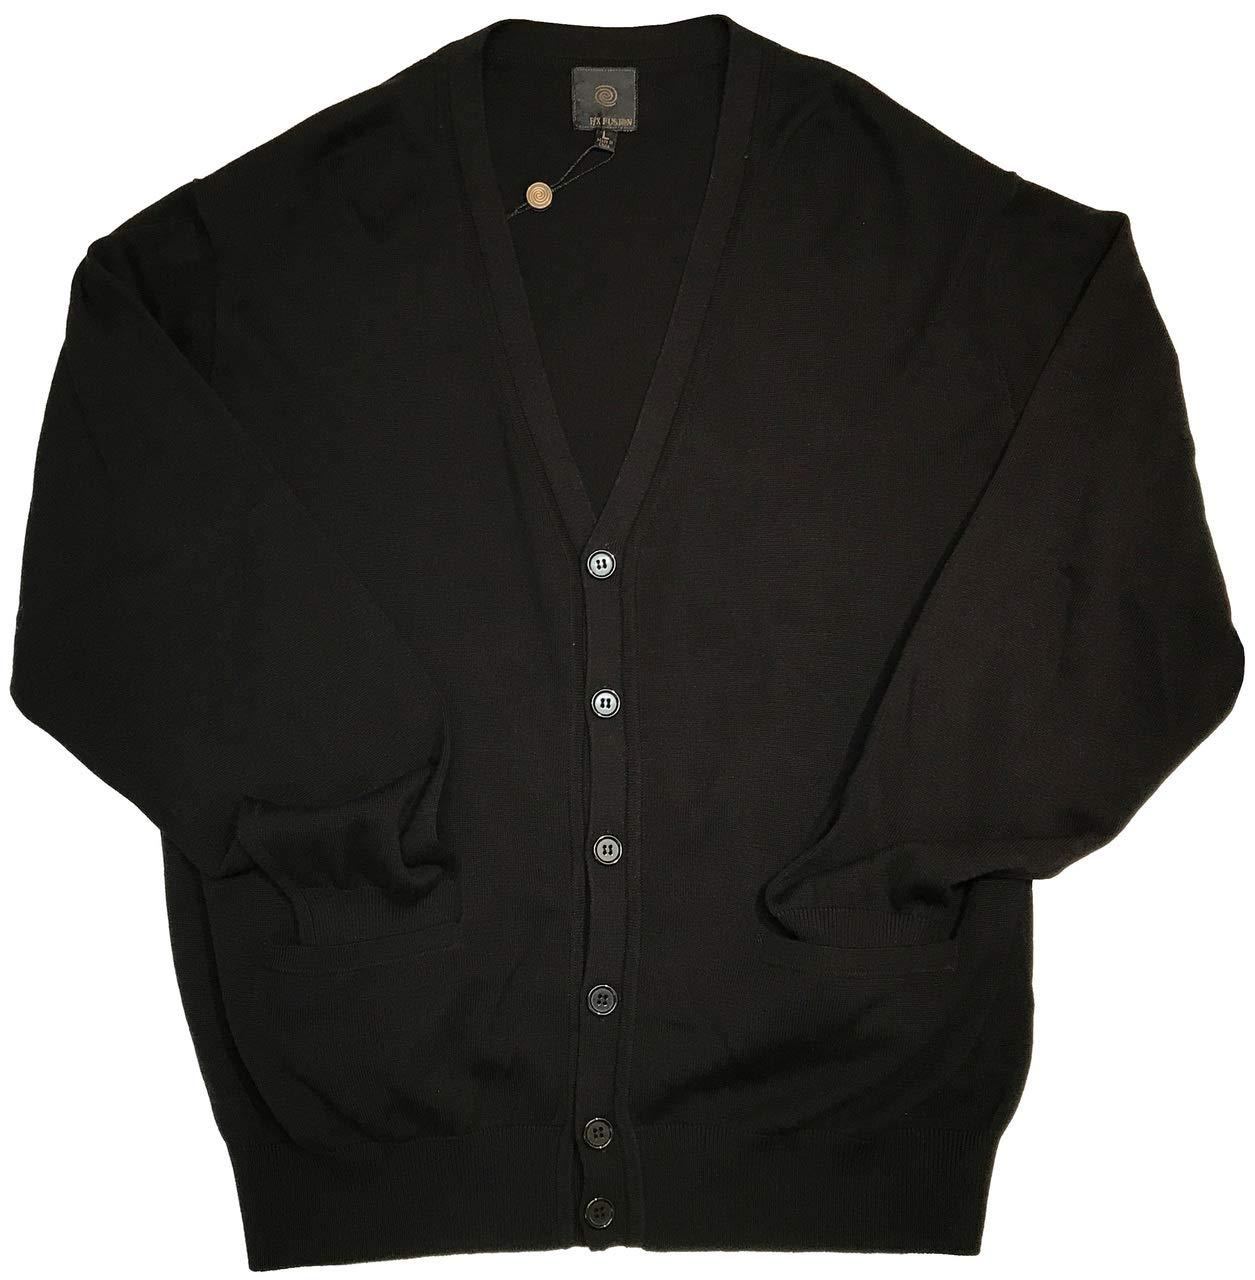 Big and Tall Luxury Cotton Acrylic Blend Cardigan (Black, 5X Big)